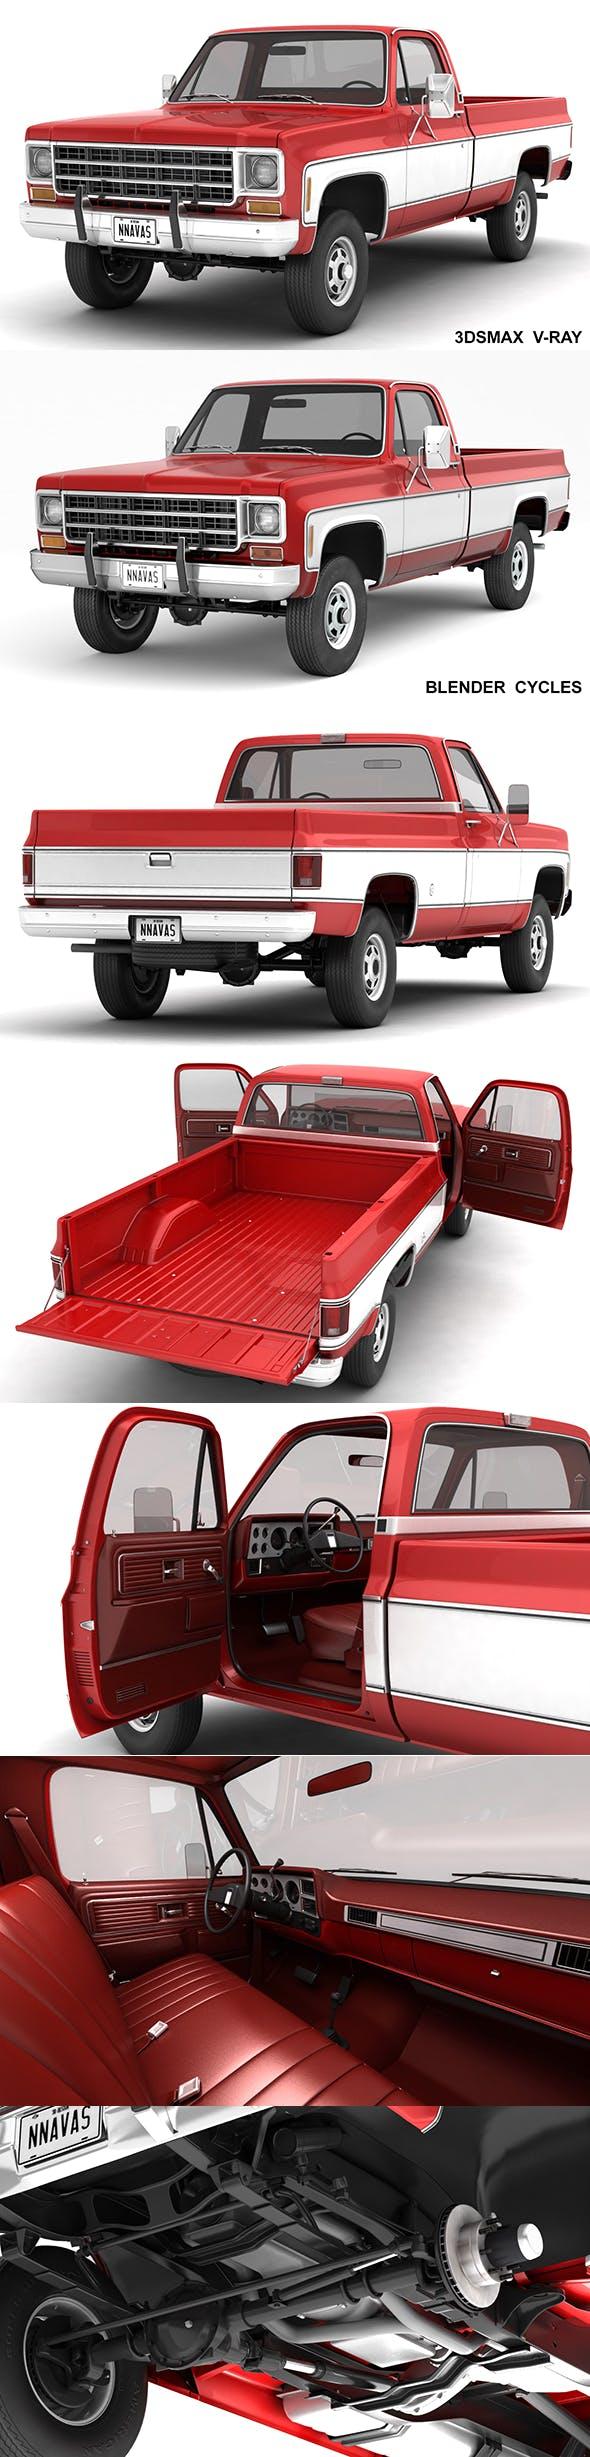 GENERIC 4WD PICKUP TRUCK 7 - 3DOcean Item for Sale